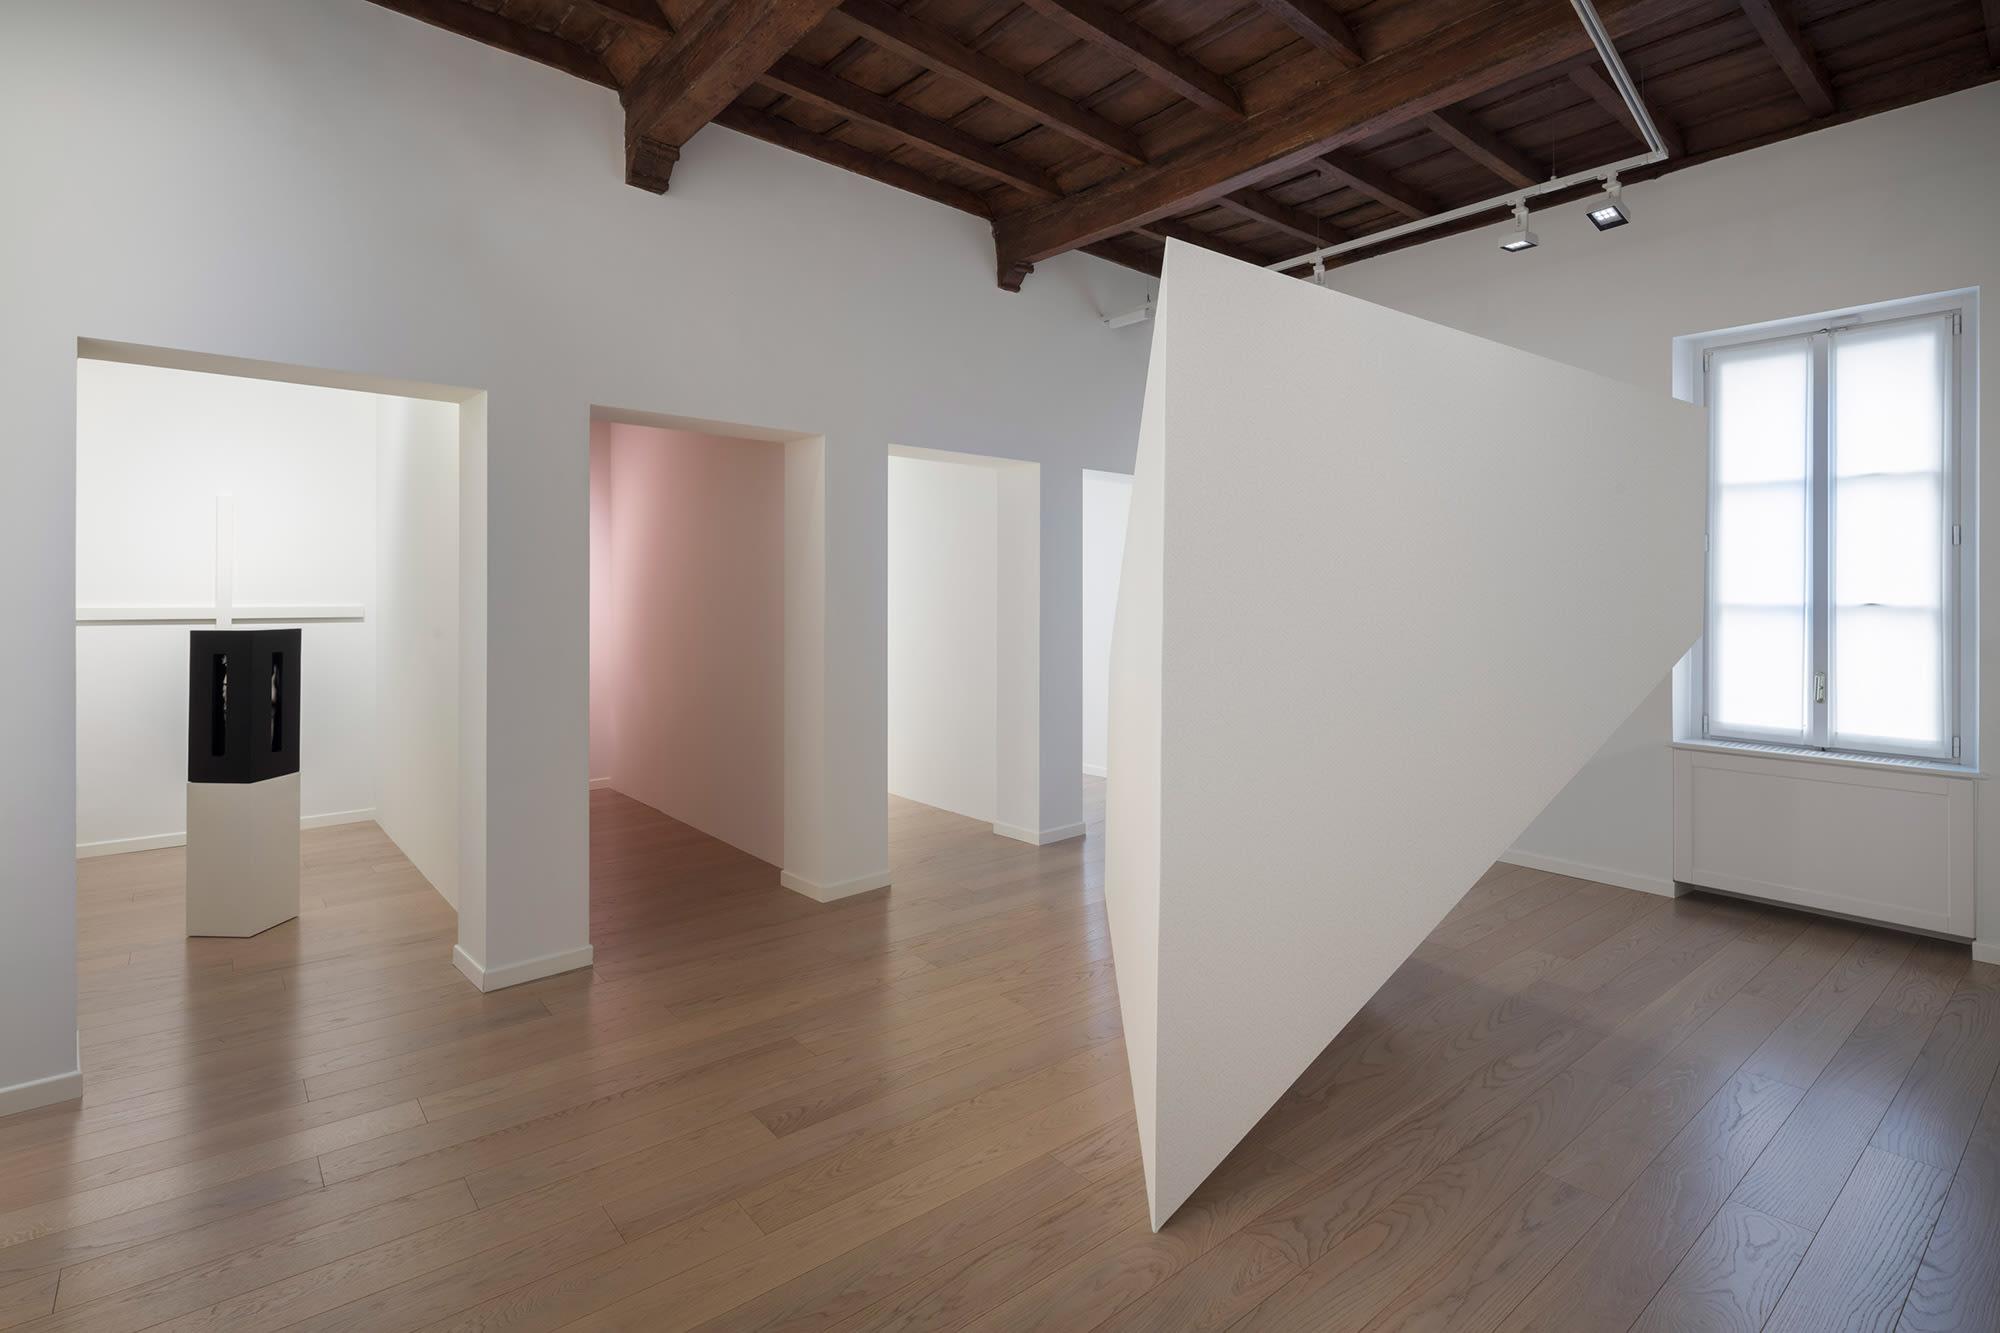 Fondazione Carriero Sol Lewit Picture